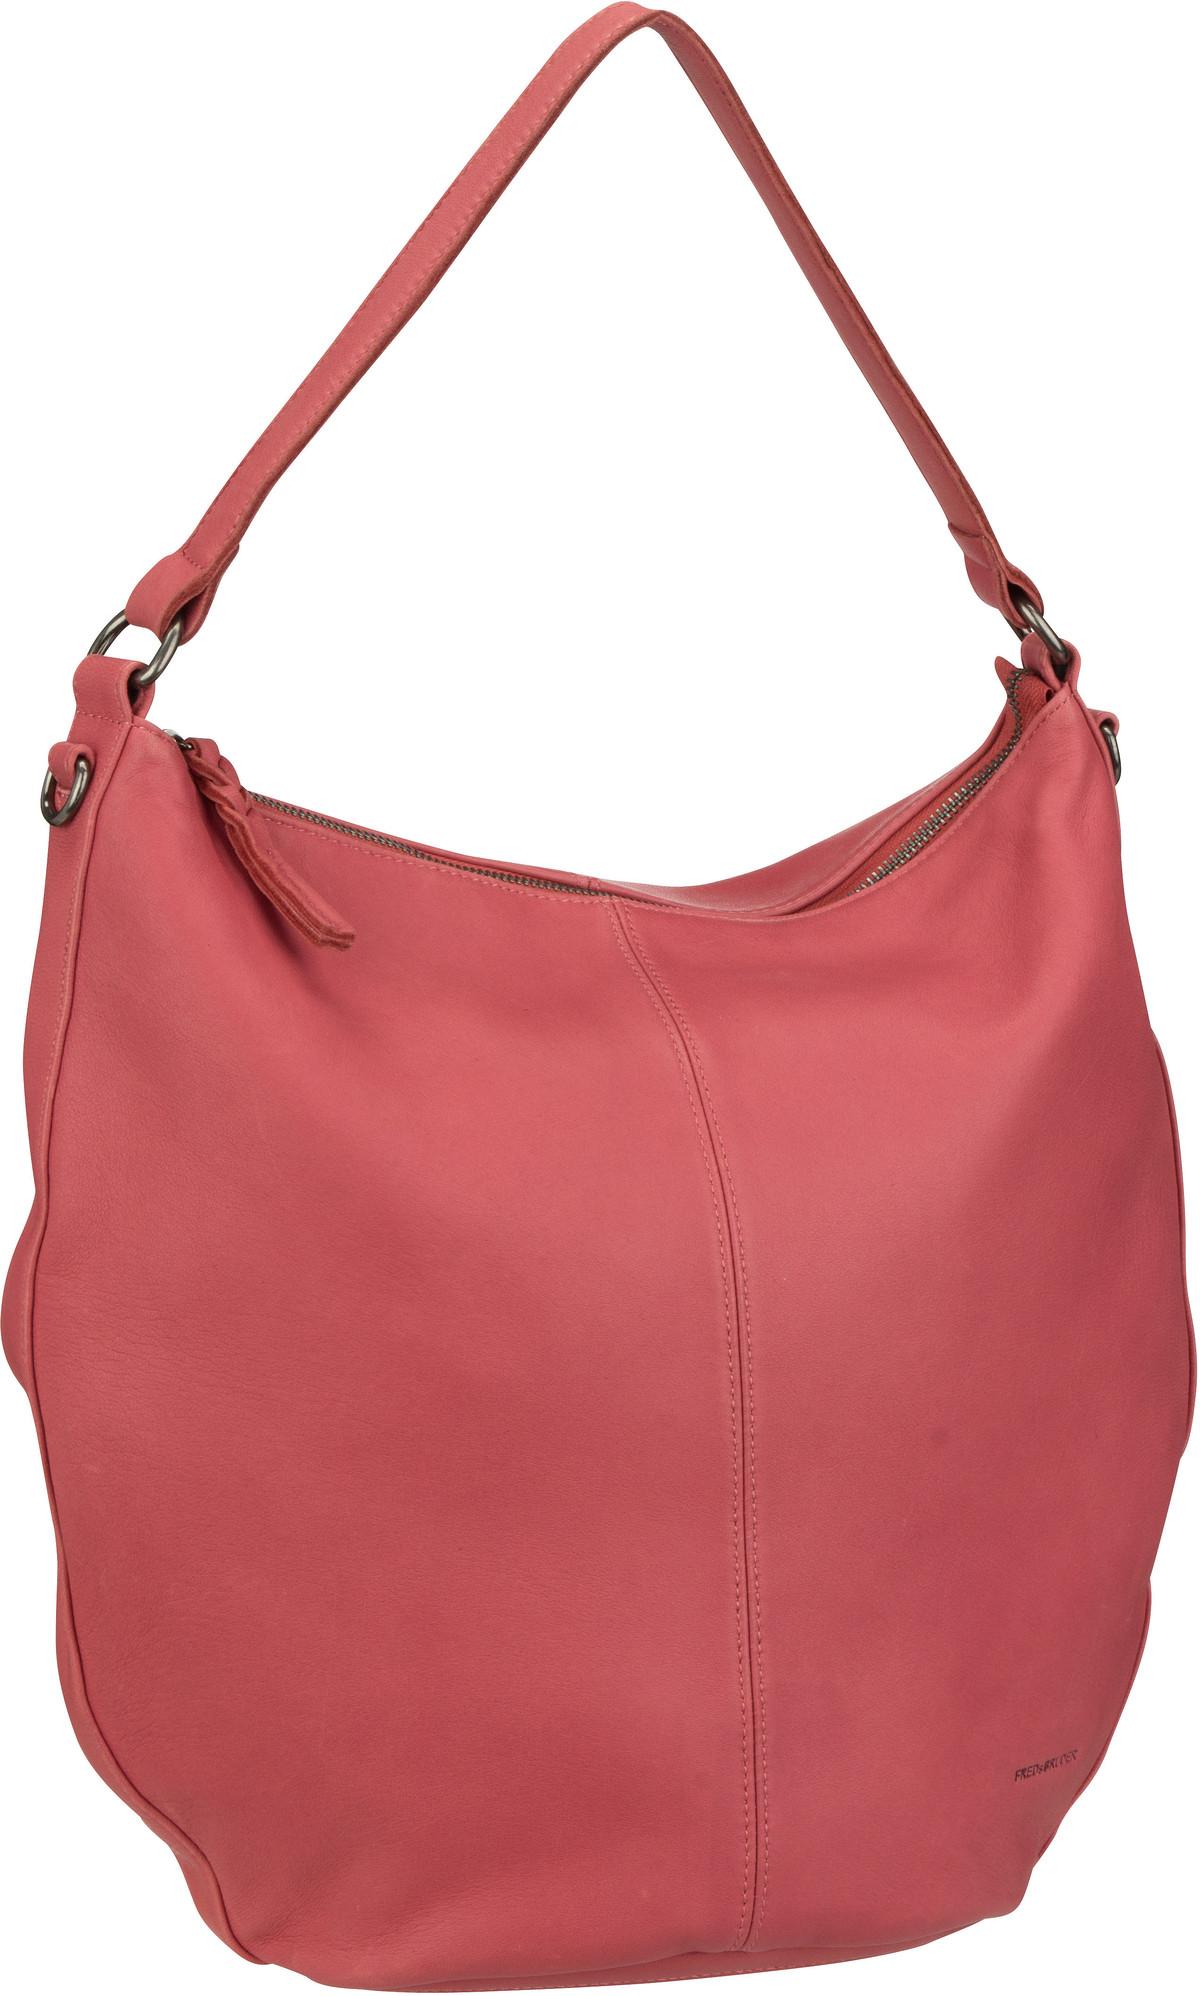 Handtasche Elle Shrimp